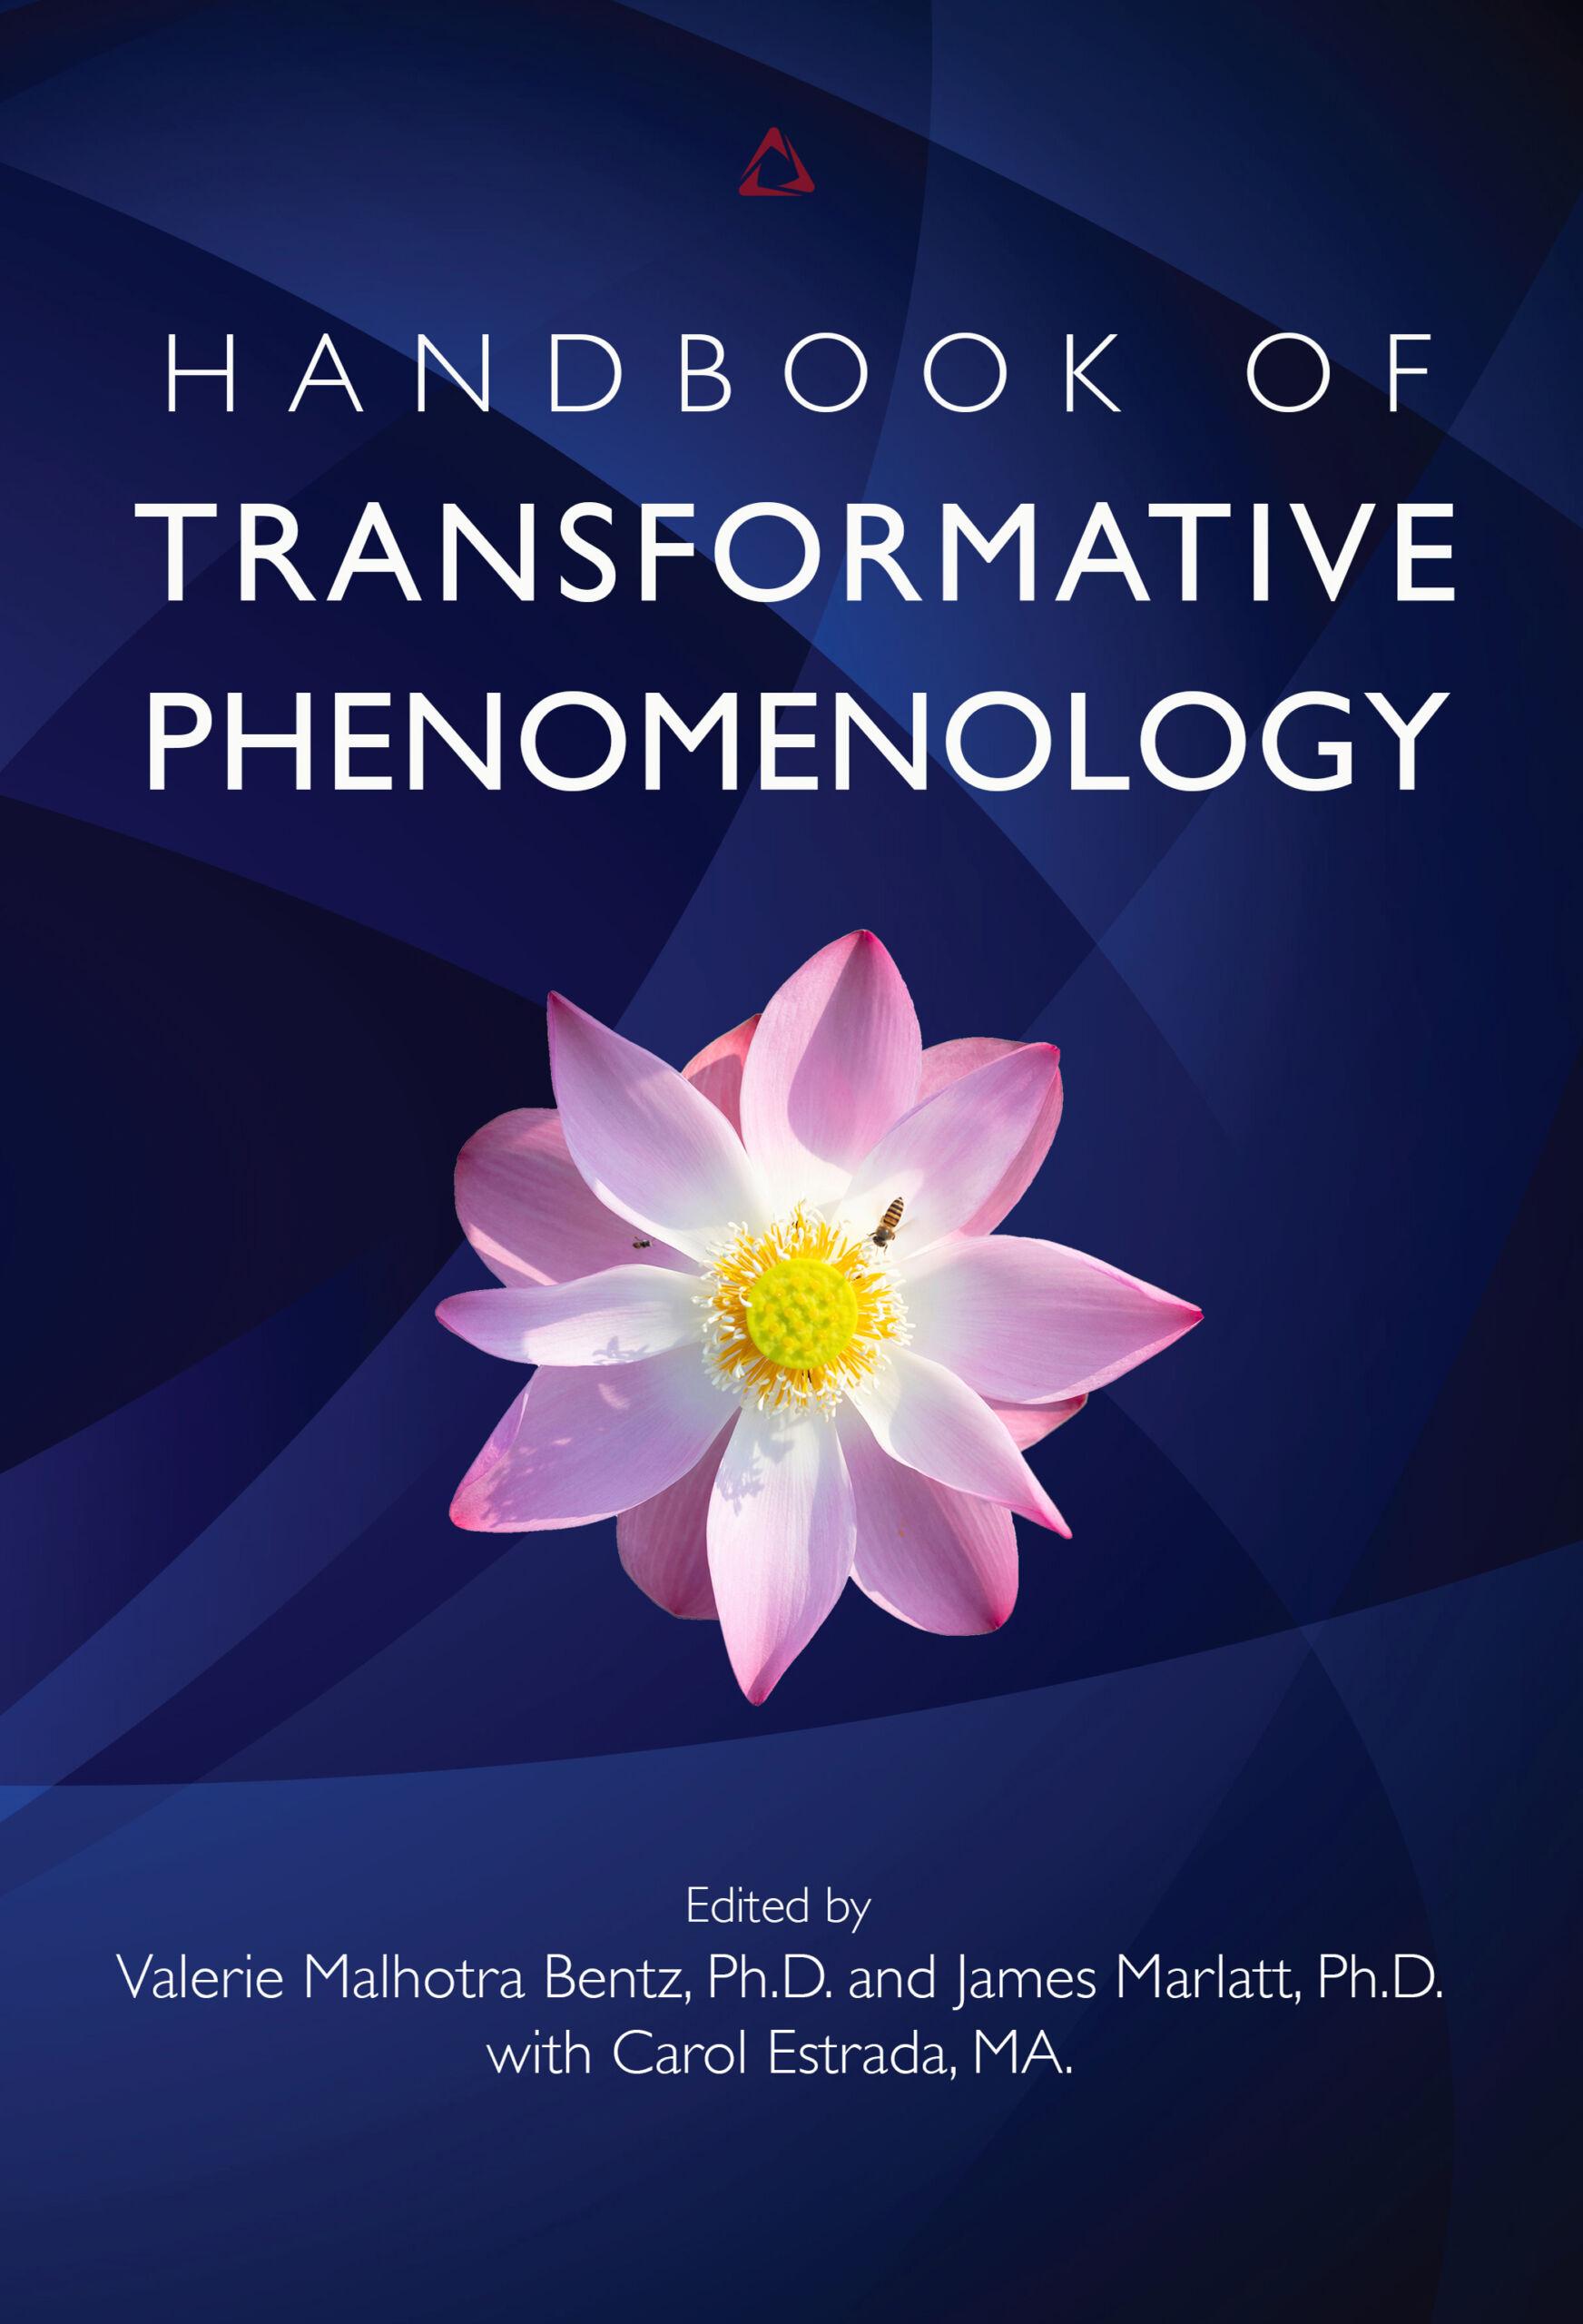 Handbook of Transformative Phenomenology